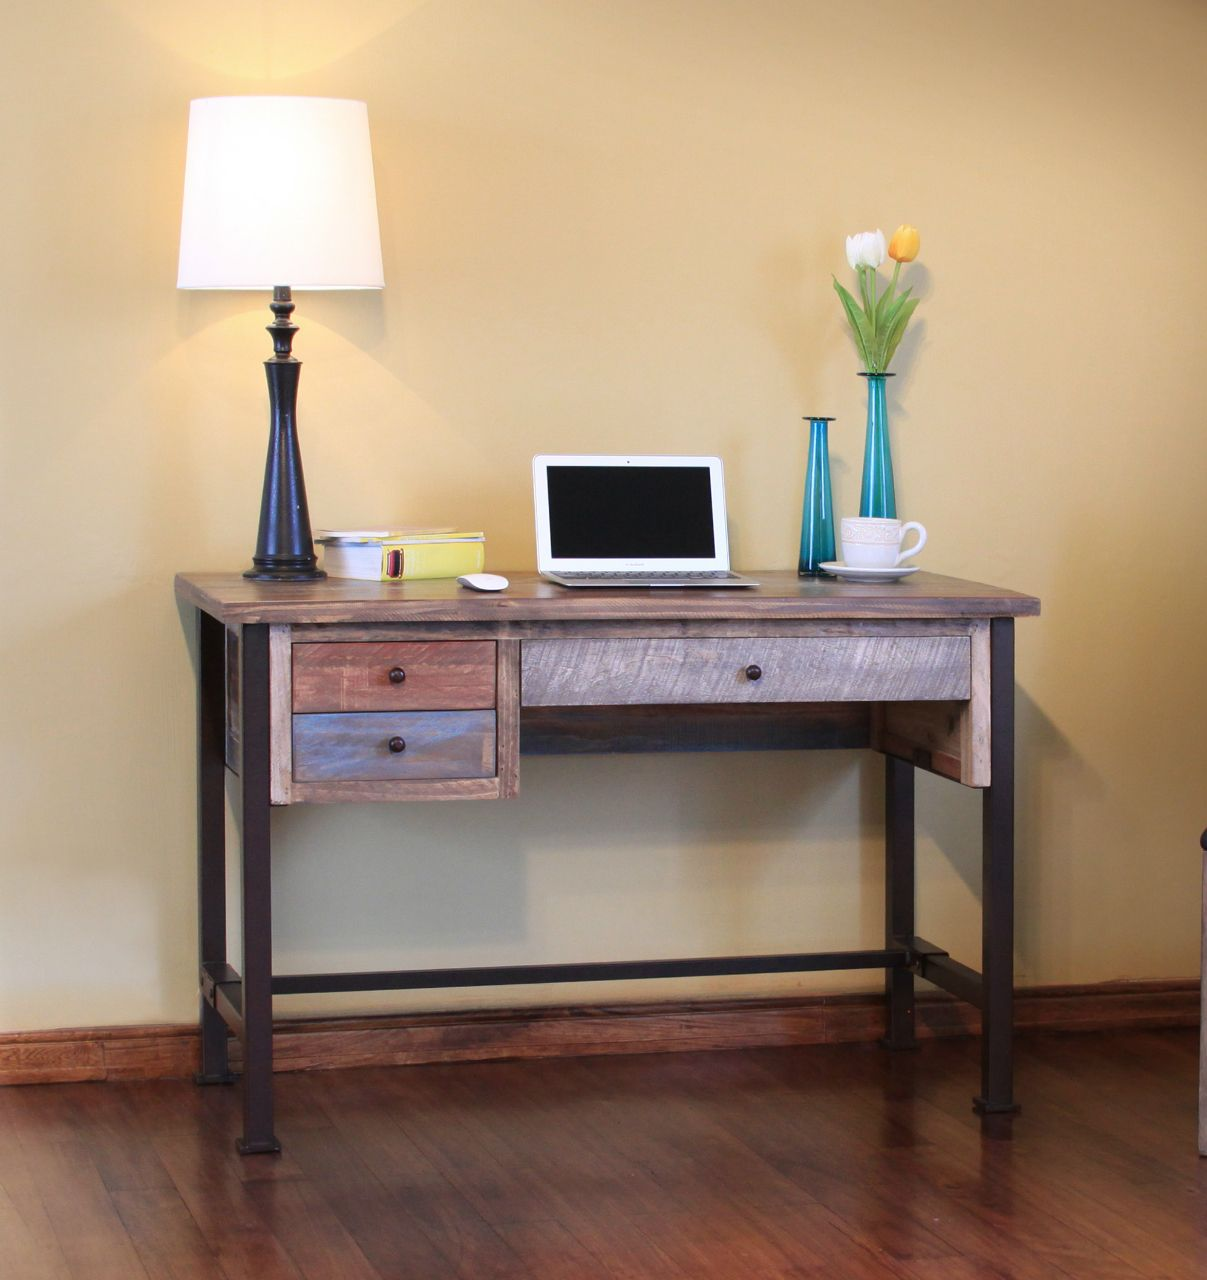 Antique Writing Desk | American Home | Albuquerque, Santa Fe, Farmington -  NM - Antique Writing Desk THE OFFICE Pinterest Antiques, Desk And